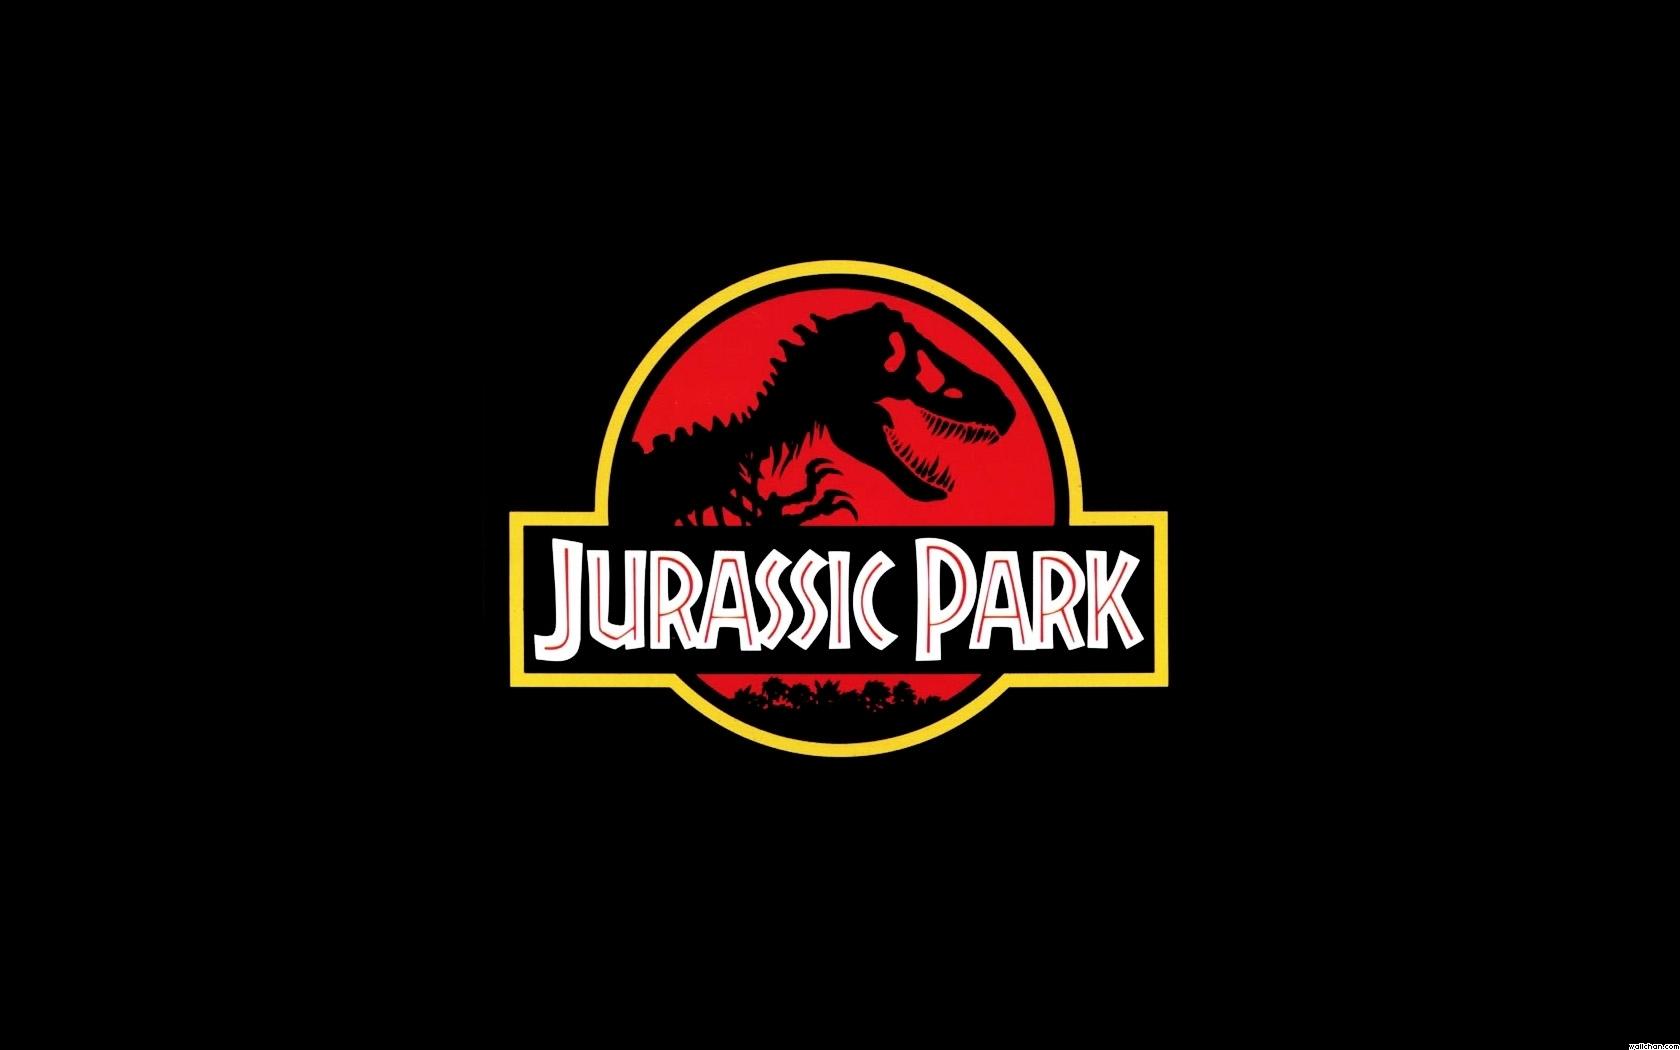 Jurassic park logo clipart svg free stock How Jurassic Park's Logo Designer Made Dinosaurs A Brand | Inverse svg free stock